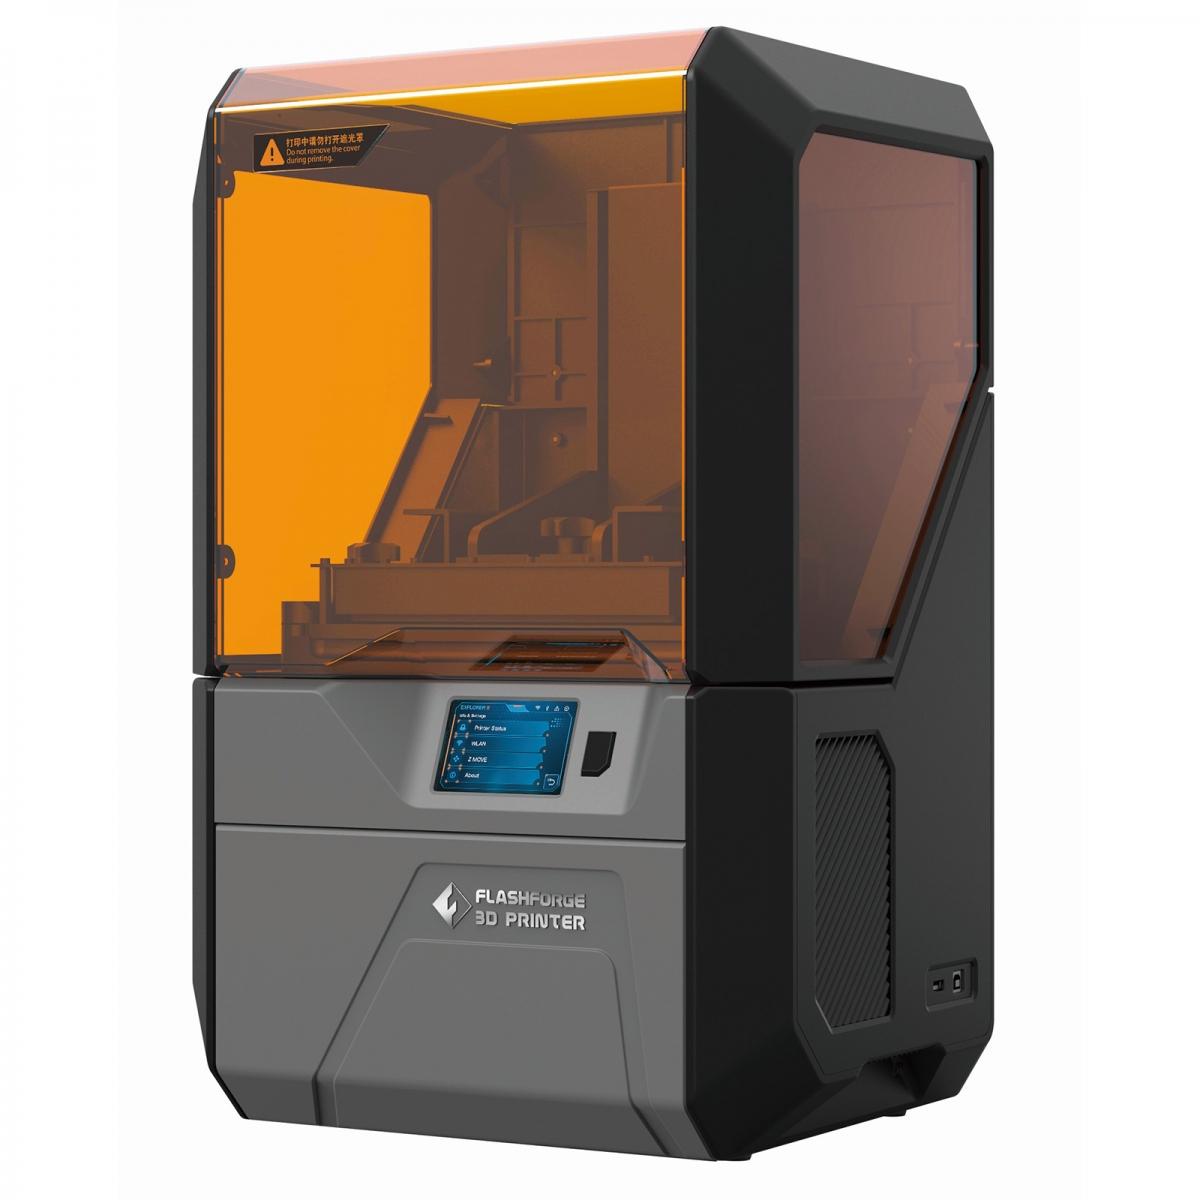 Goedkoop Flashforge Hunter DLP 3D-printer kopen